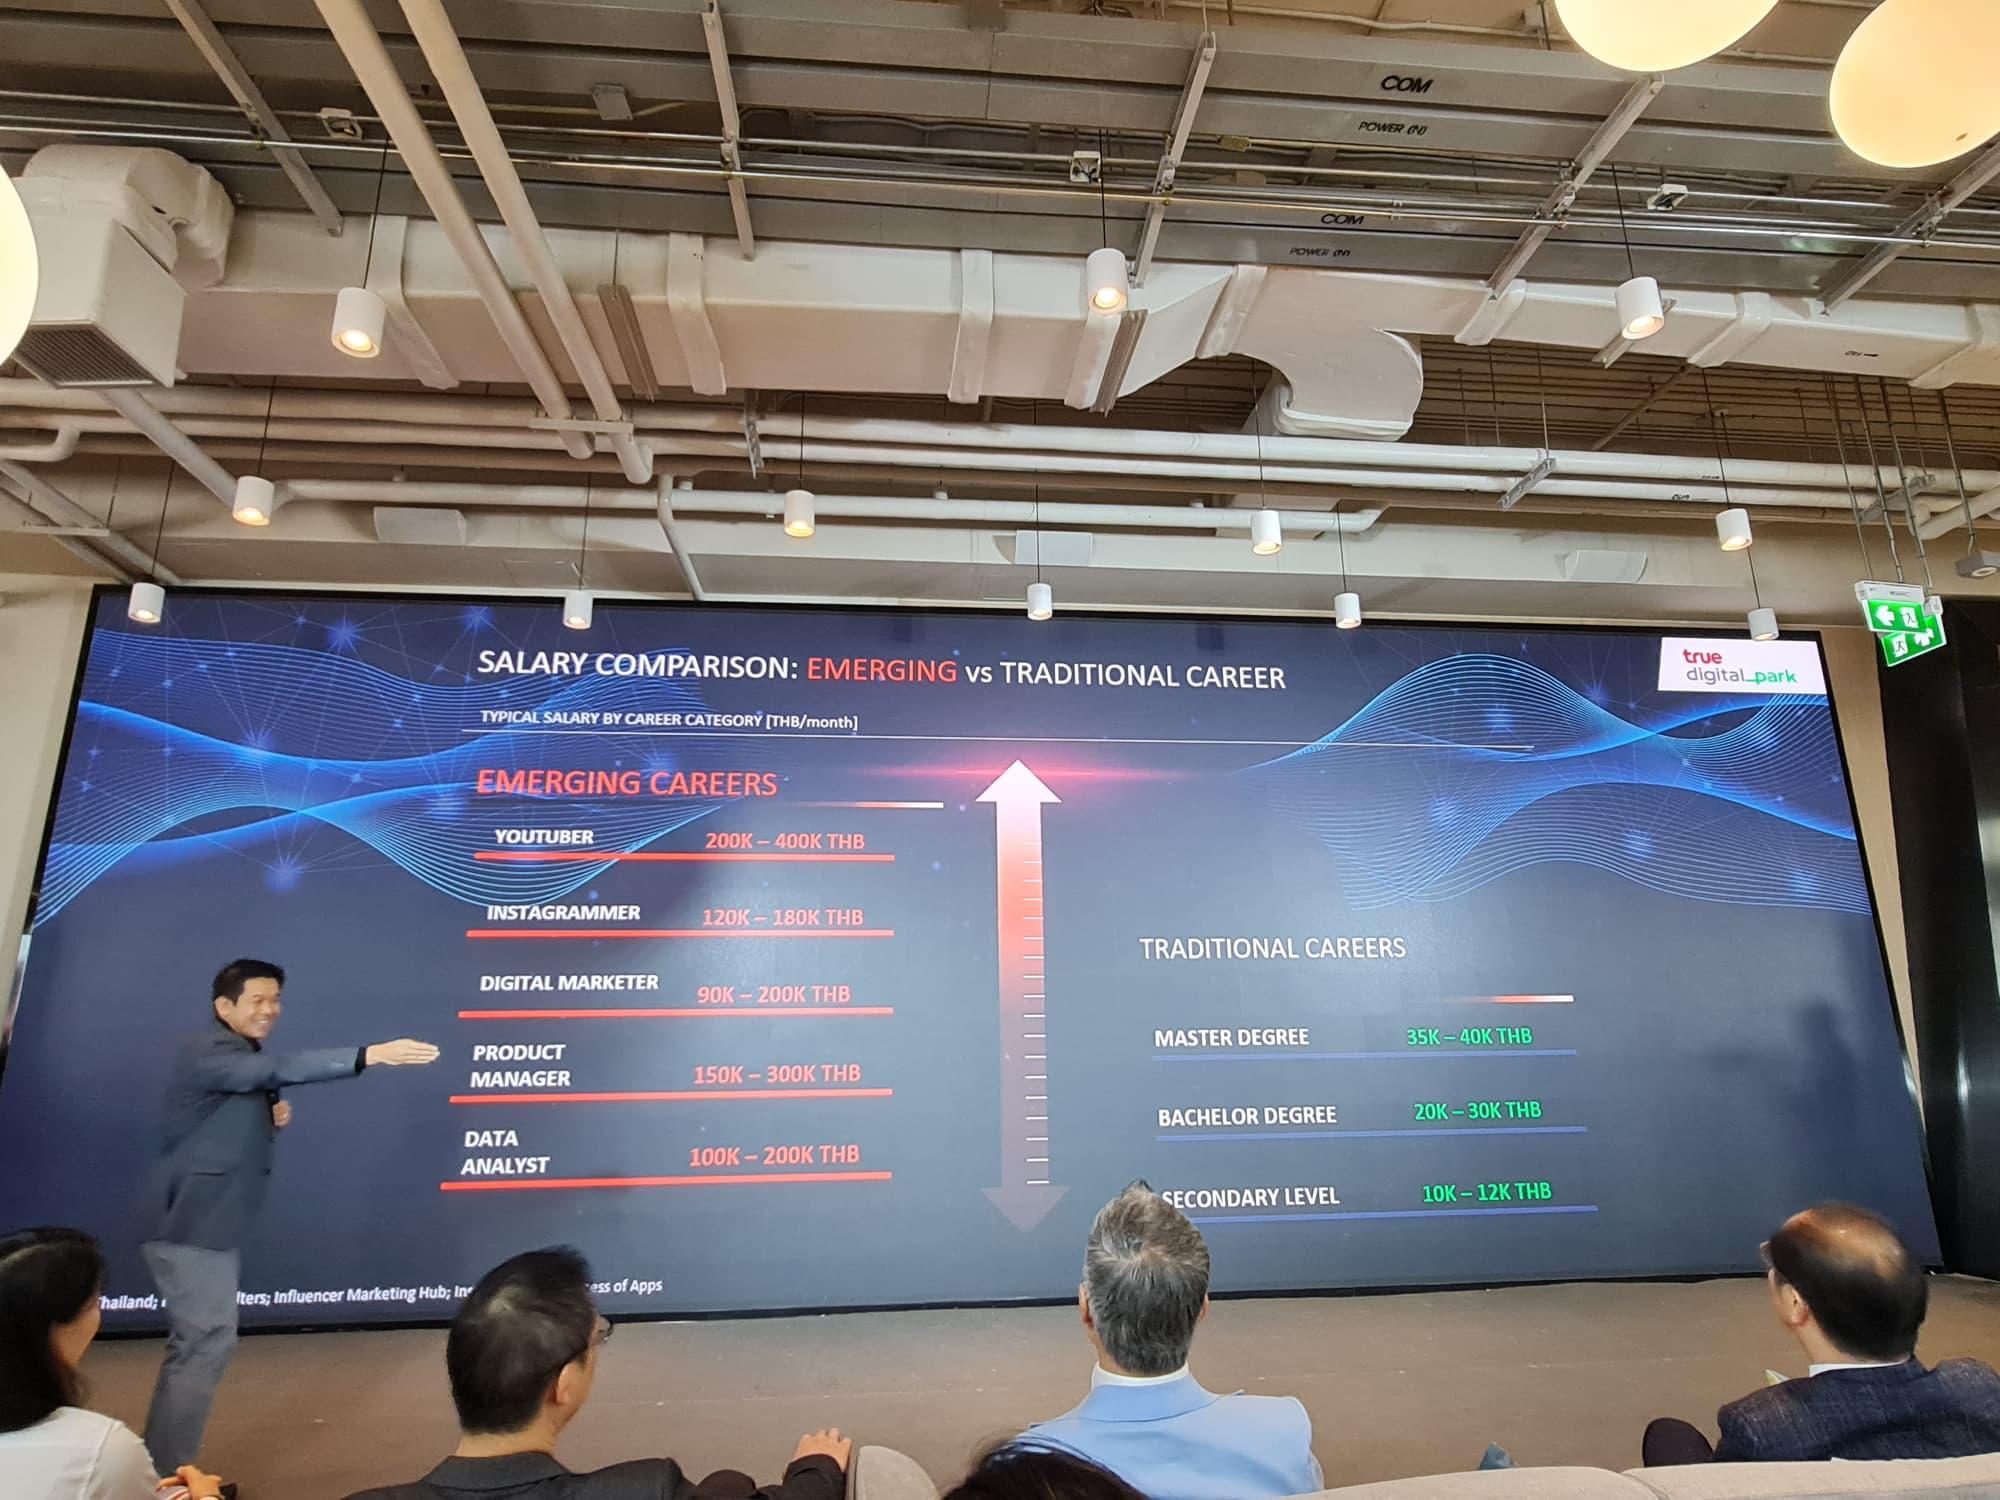 "True Digital Park เปิดตัว ""ศูนย์รวมสถาบันการเรียนรู้ด้านดิจิทัลระดับโลก""  House of Digital Academy แห่งแรกและแห่งเดียวในไทย"